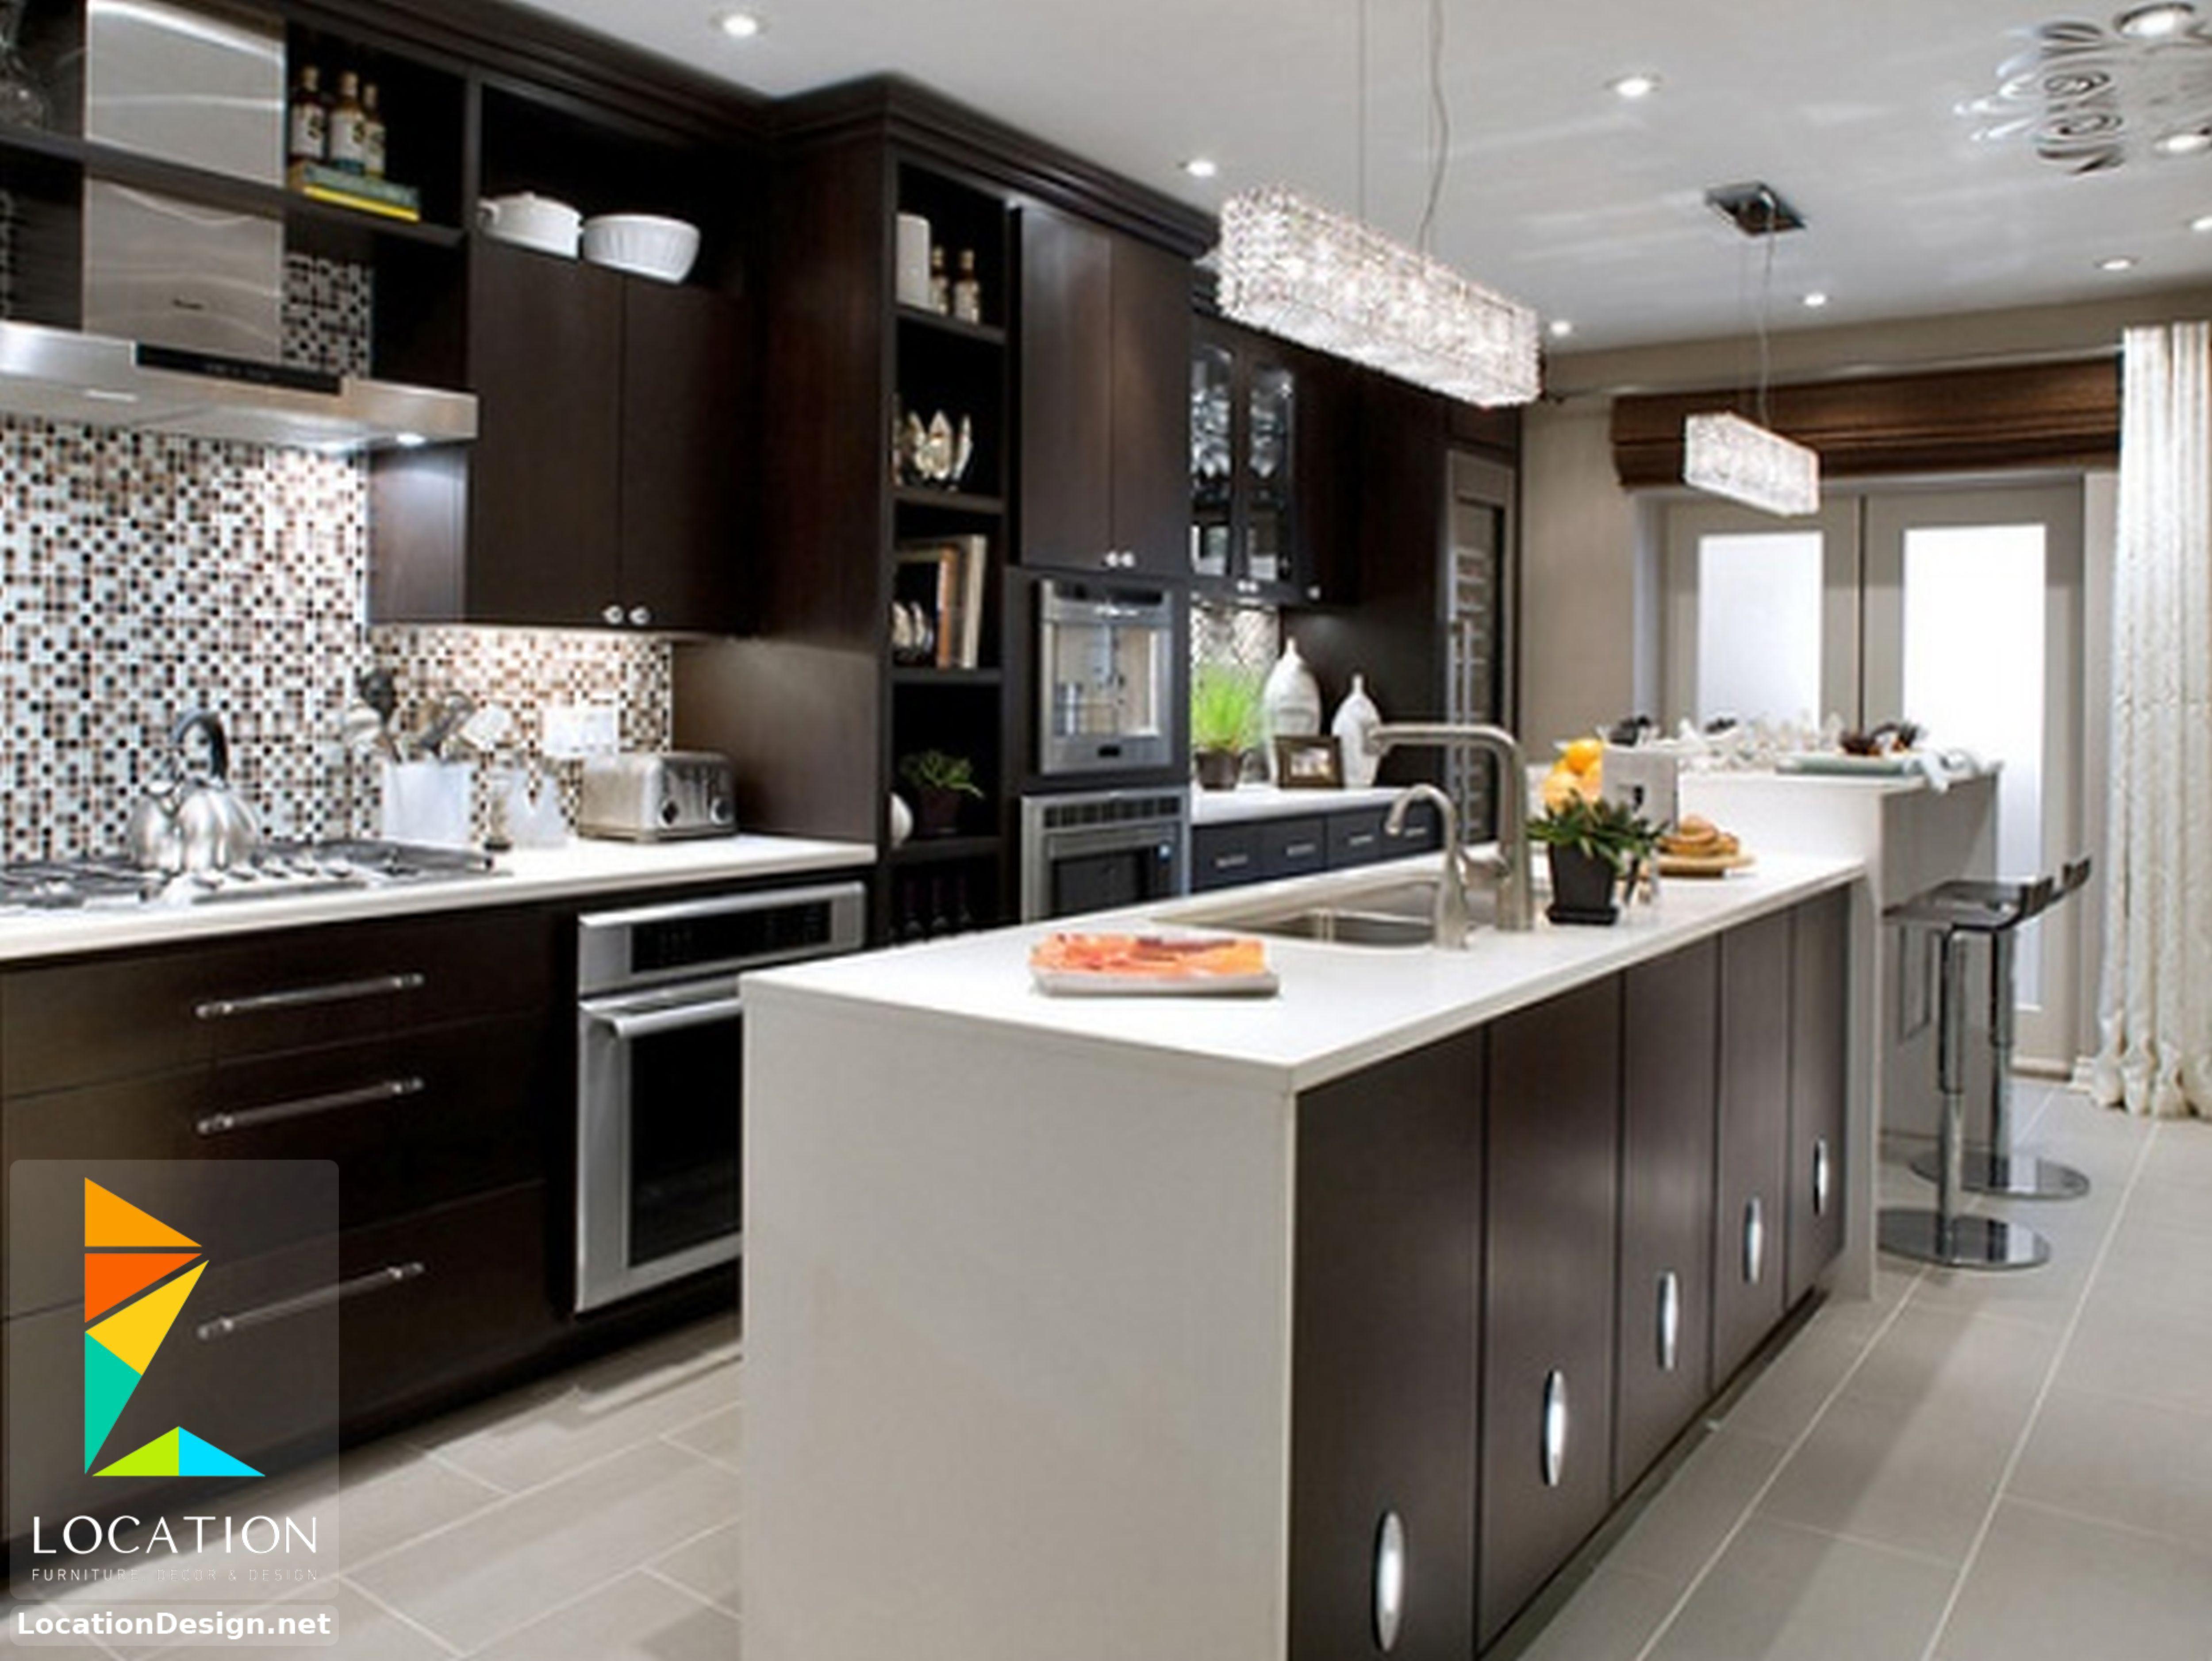 ديكورات مطابخ مودرن صغيرة 2019 2020 Kitchen Inspiration Design Kitchen Decor Modern Interior Design Kitchen